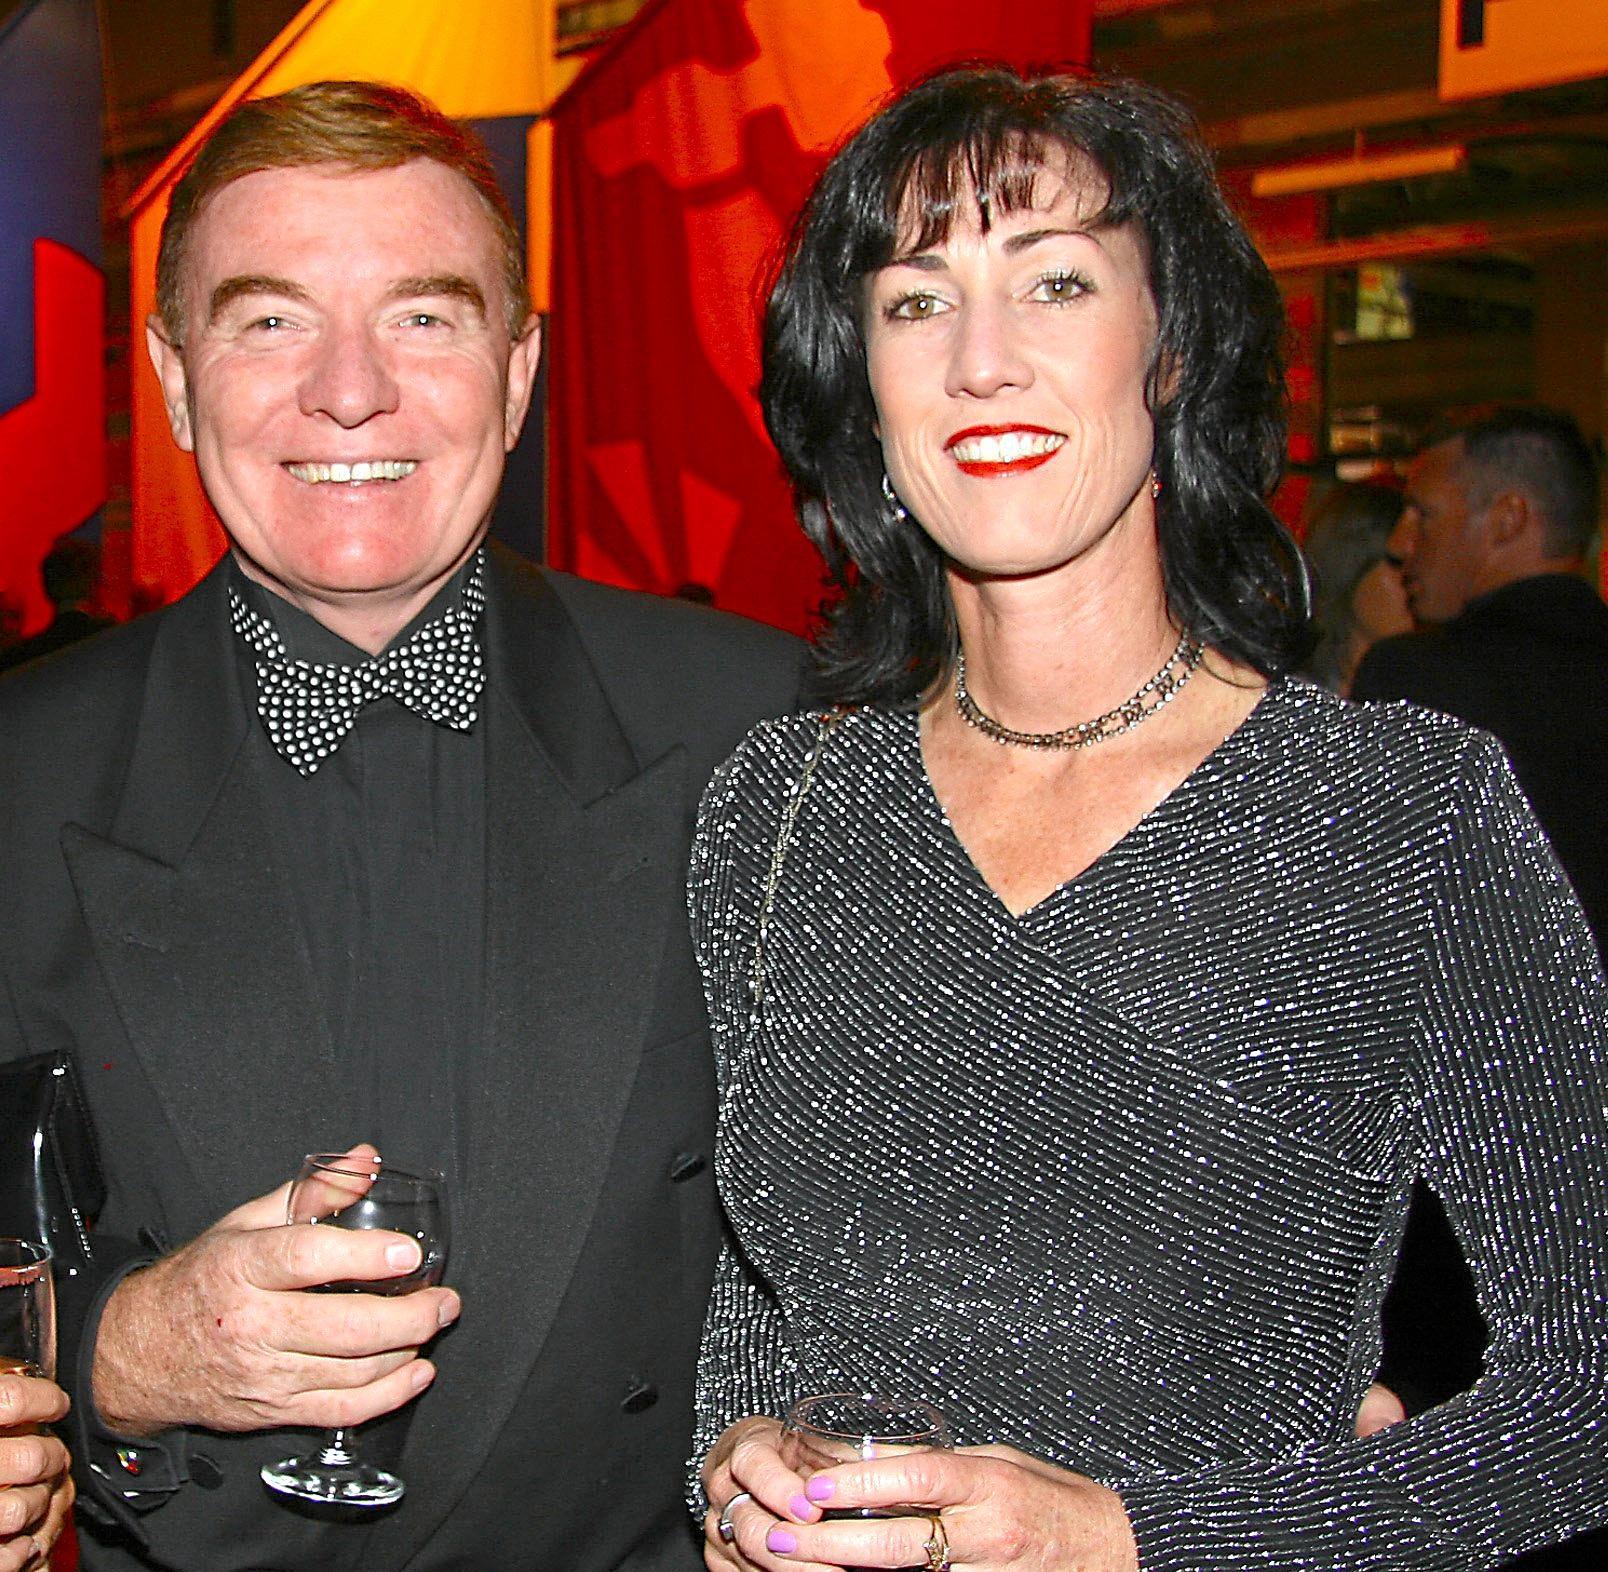 Carl Wulff and Sharon Oxenbridge